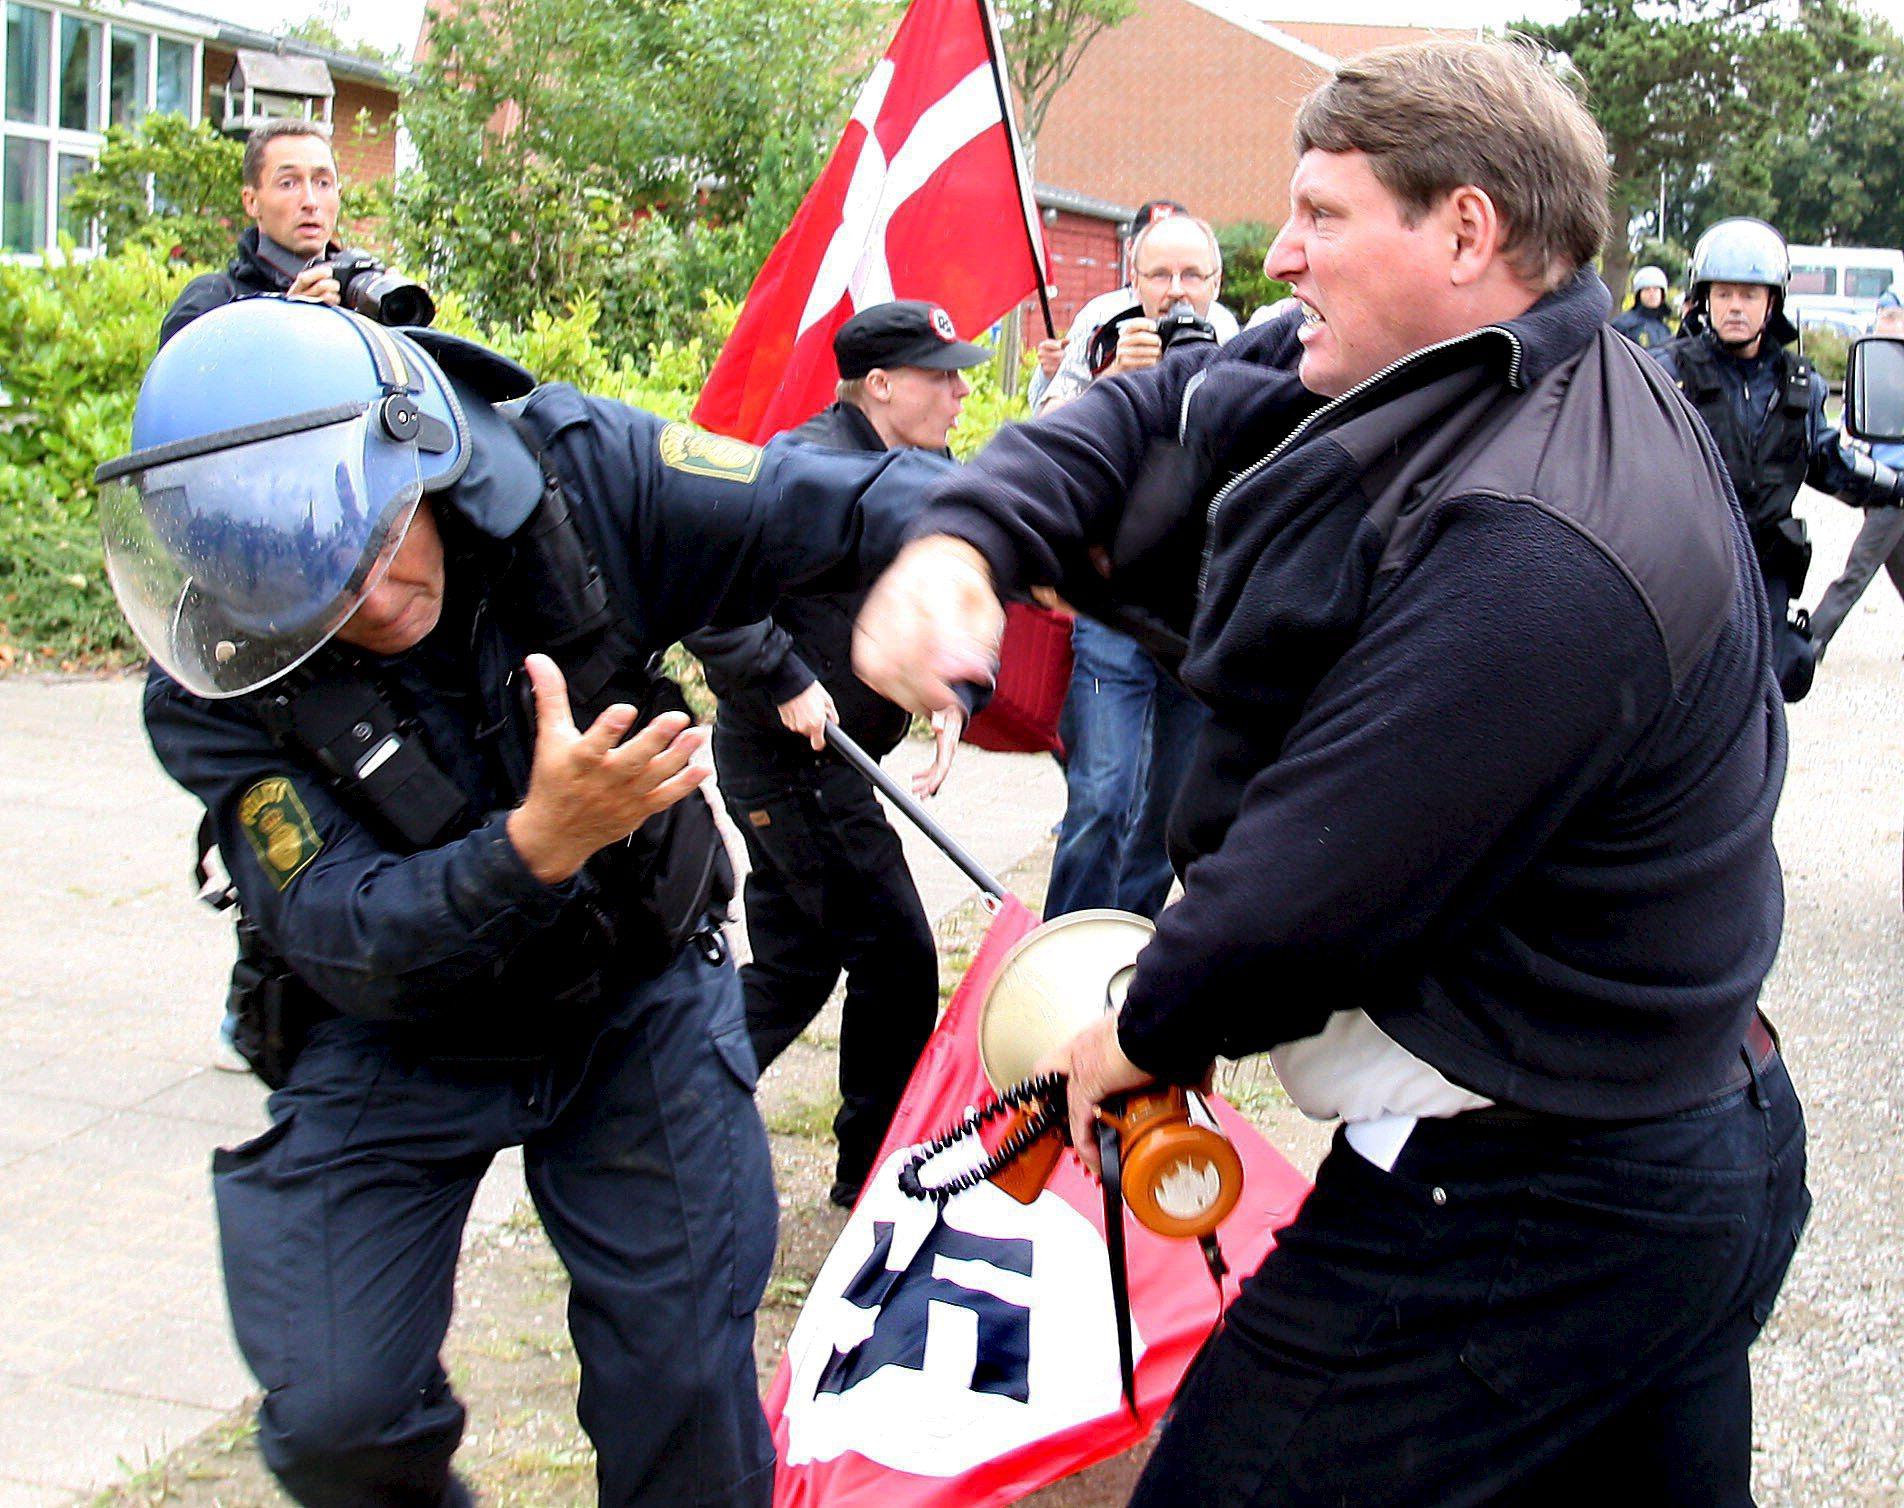 Un manifestante nazi se enfrenta a la policía en Kolding, Dinamarca.EFE